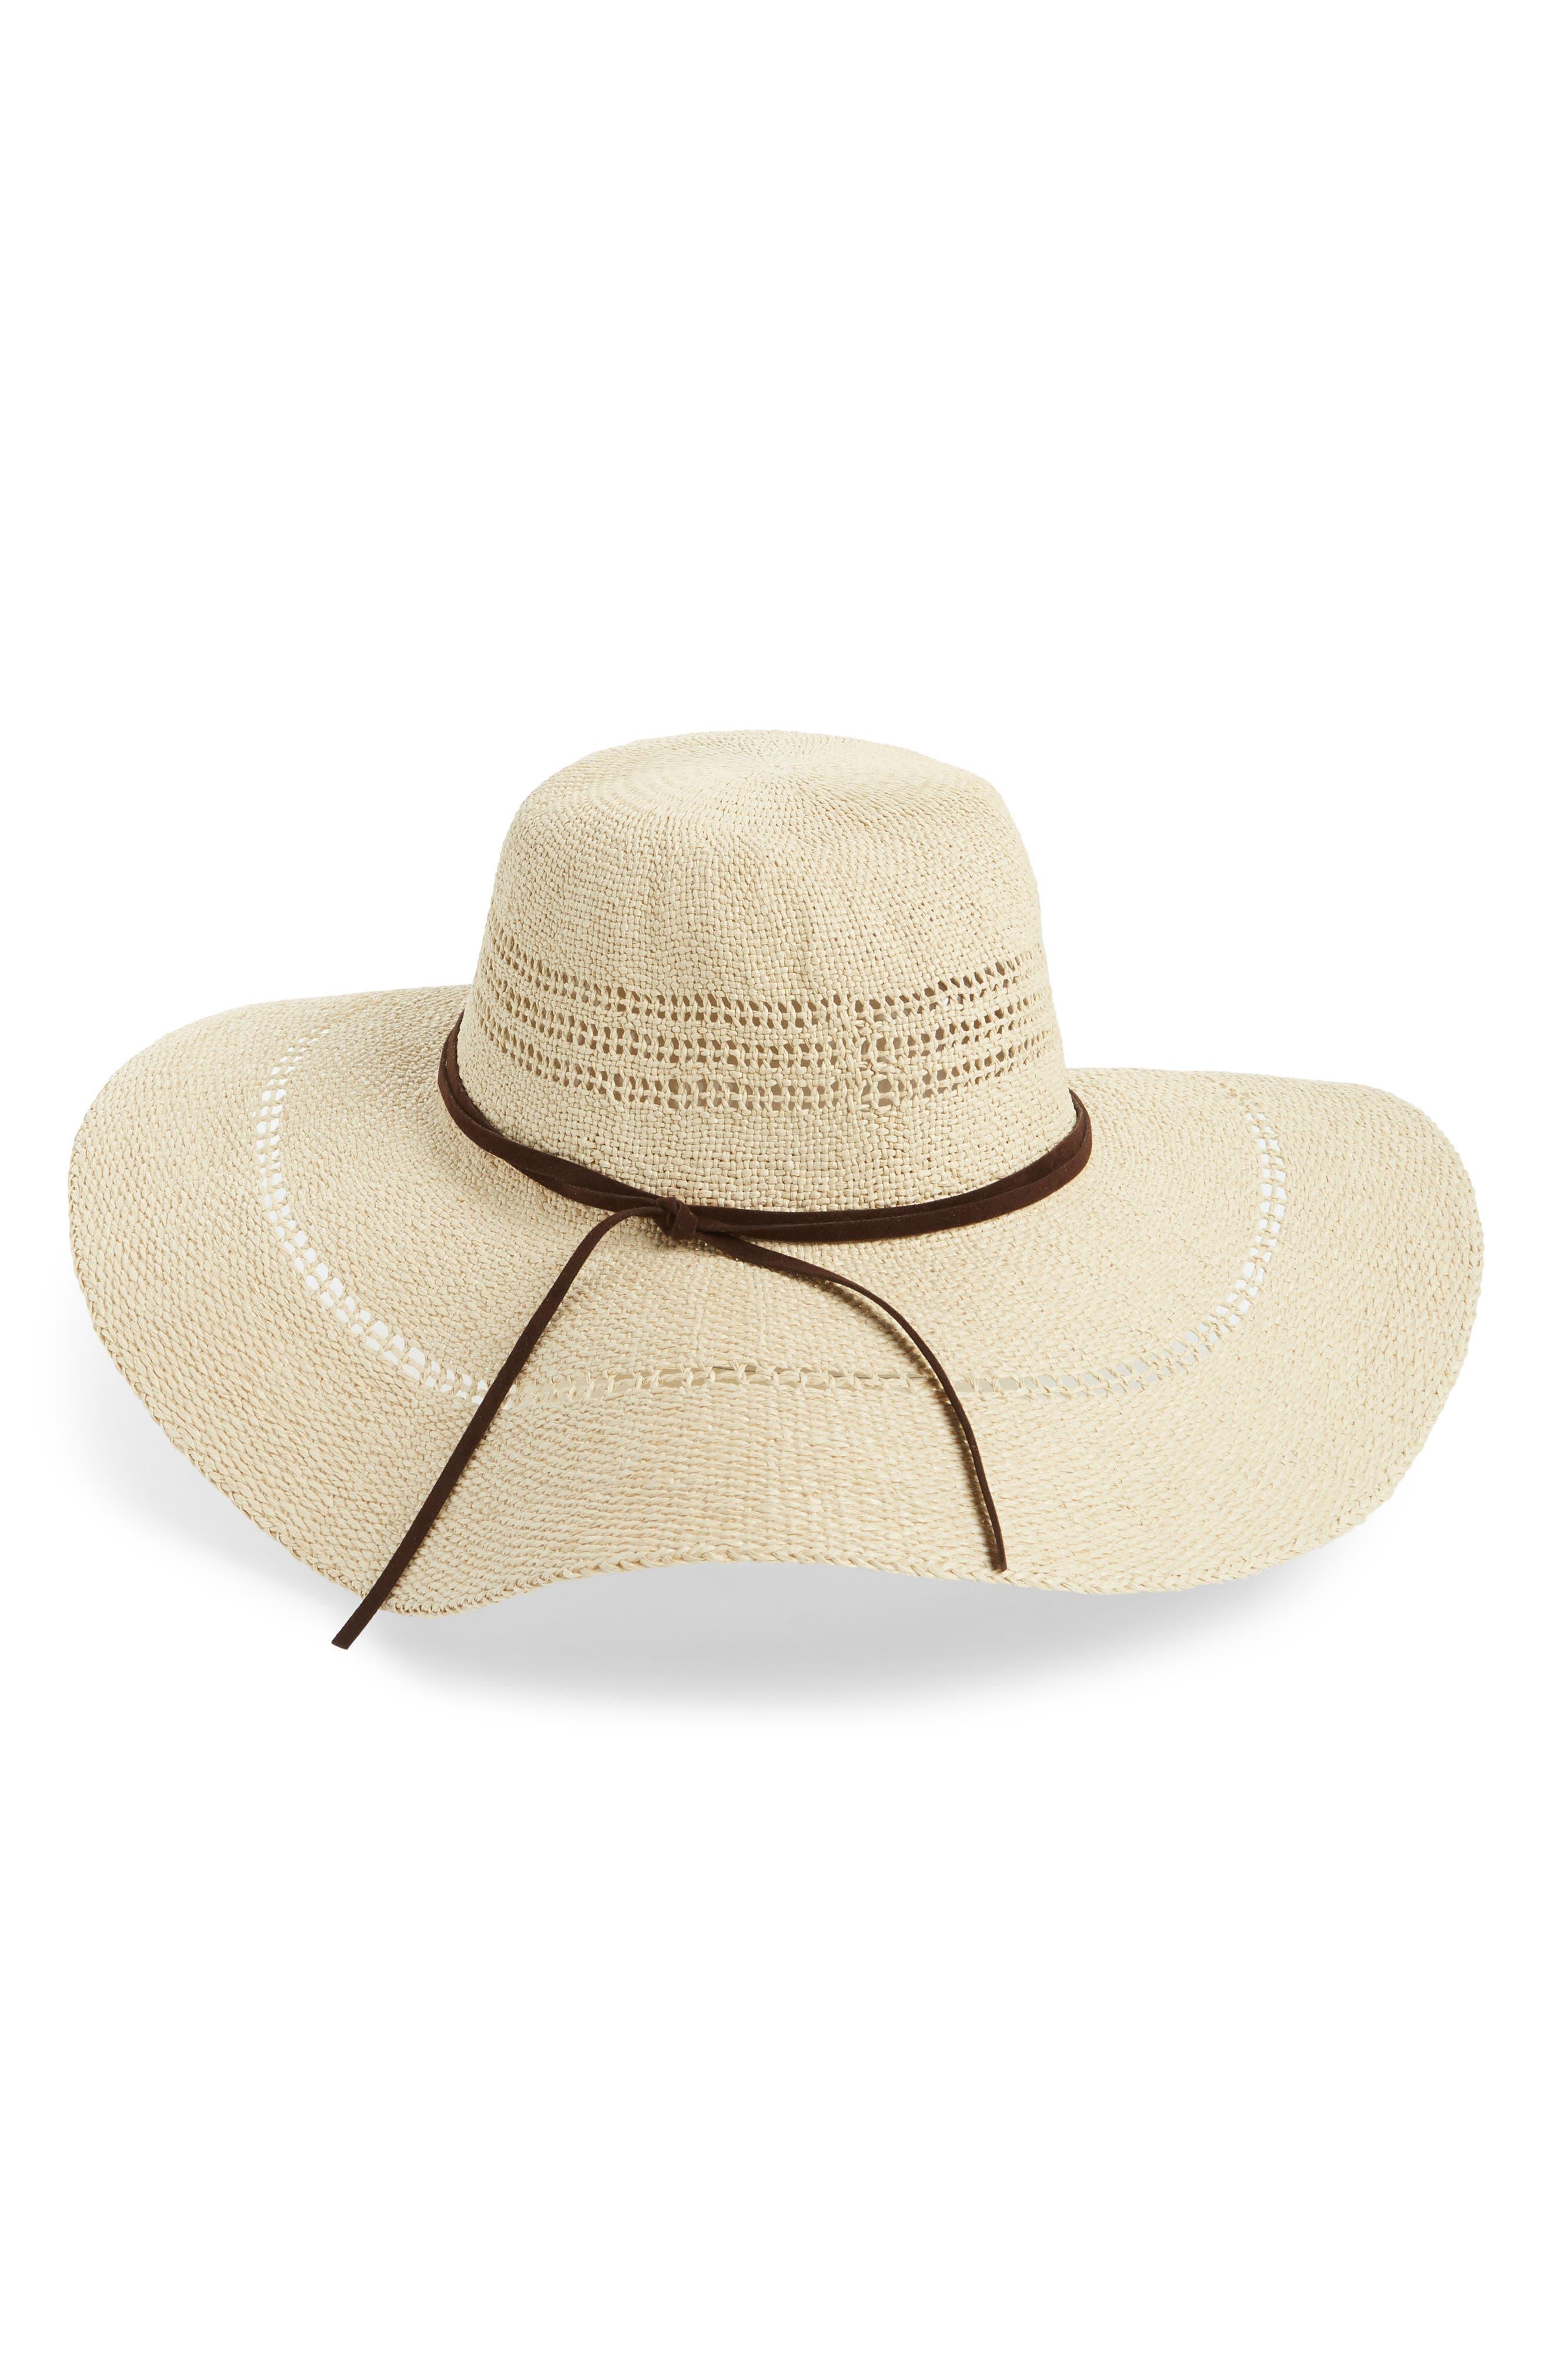 Rip Curl Ritual Boho Straw Hat